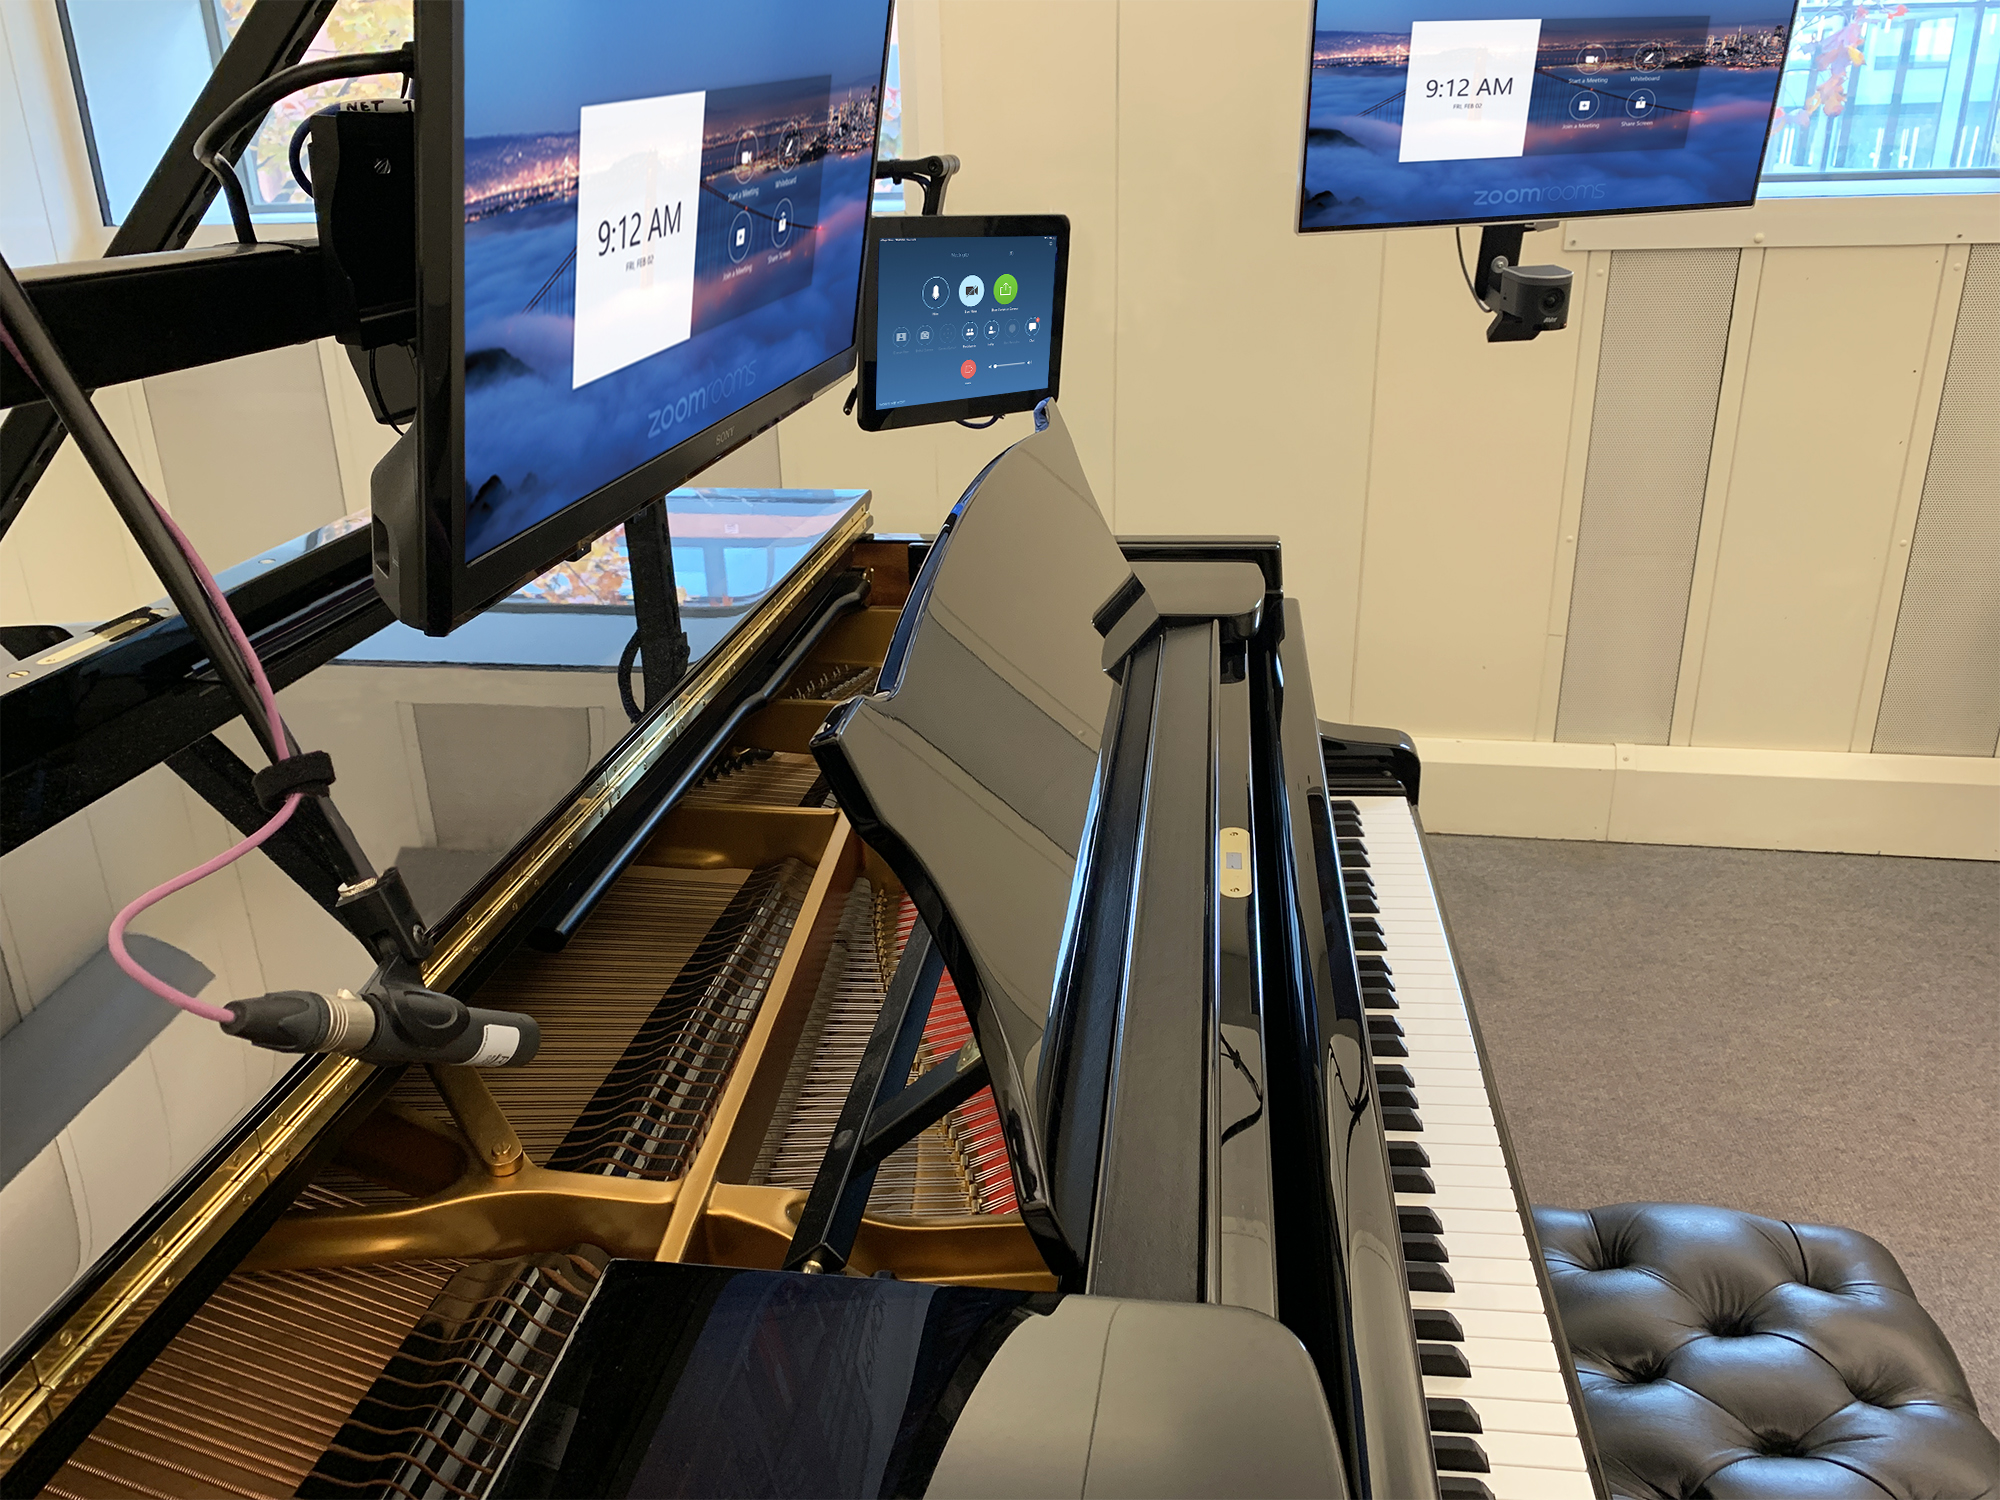 Manchester College Piano Room Upgrade